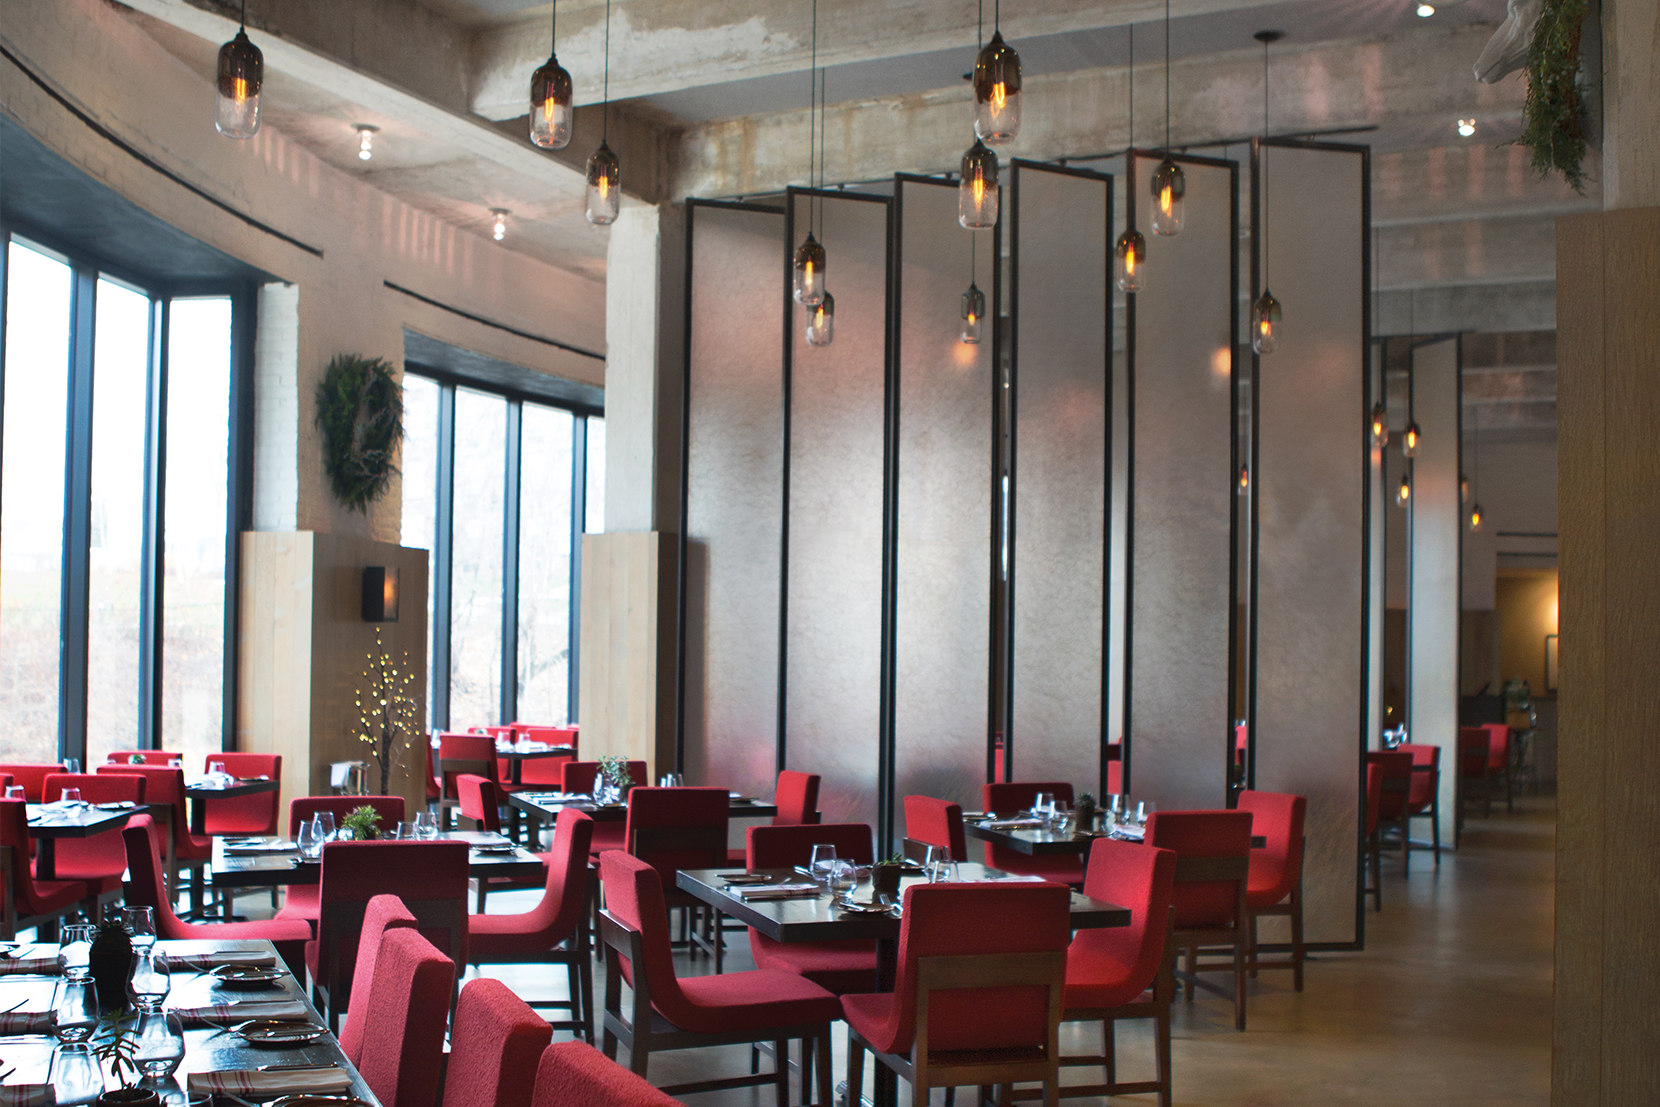 Lighting-Project-Pages_0009s_0002_Custom-Modern-Restaurant-Pendant-Lighting.png